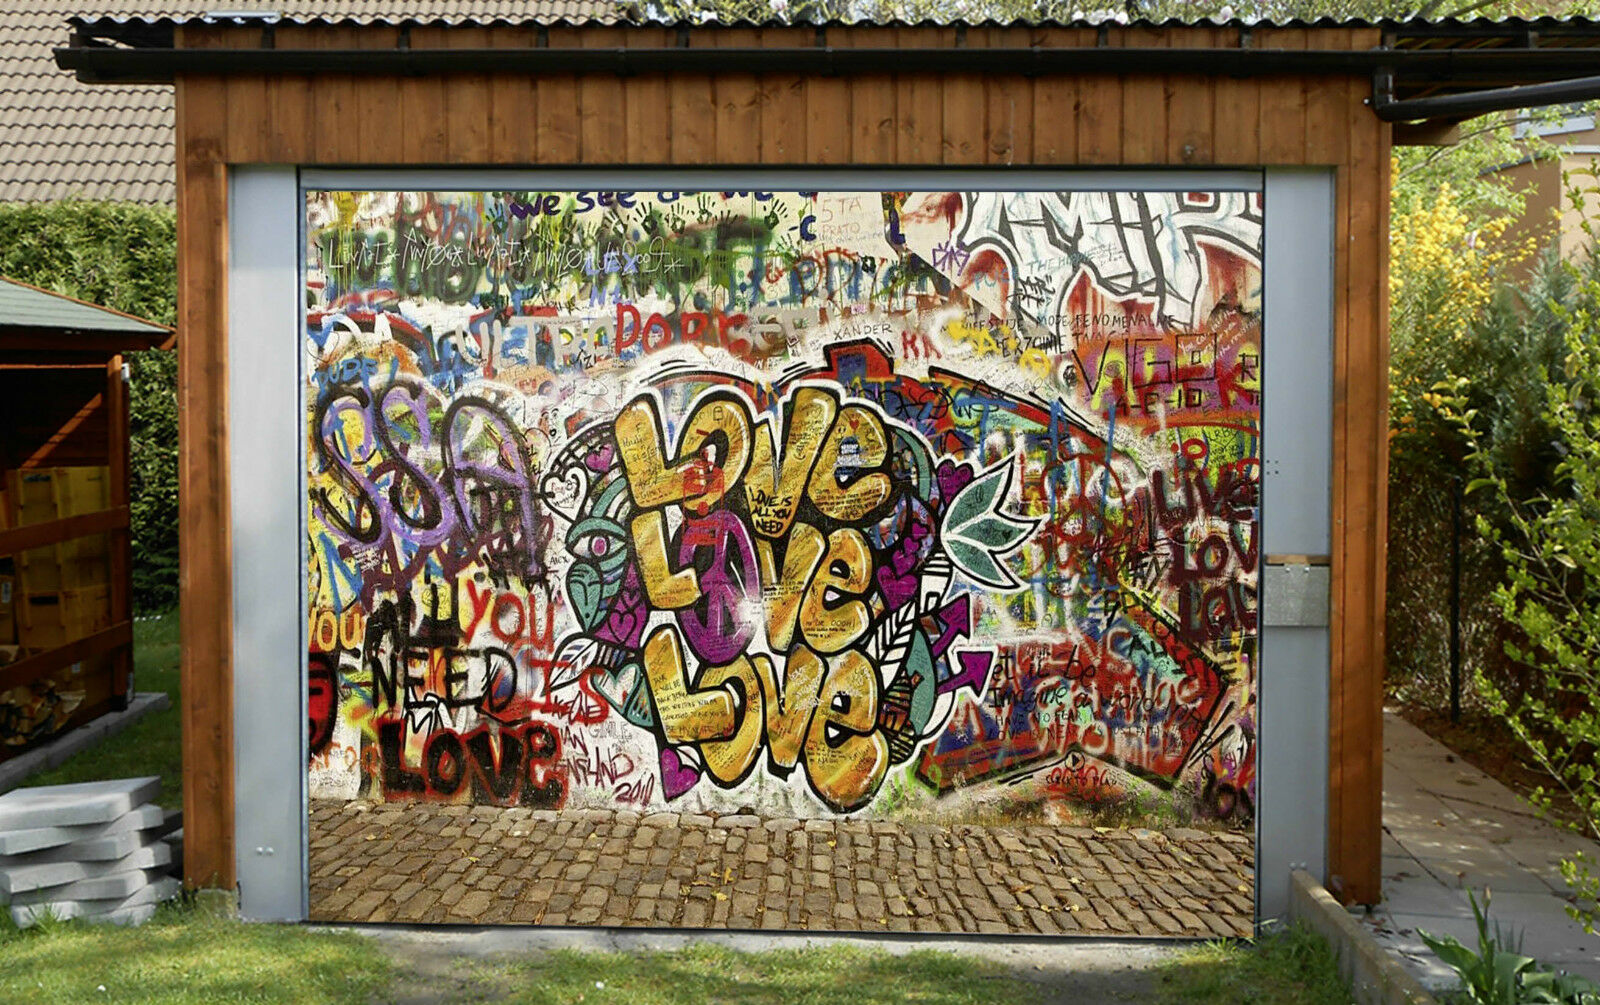 3D Street Graffiti Garage Door Murals Wall Print Decal Wall Deco AJ WALLPAPER IE